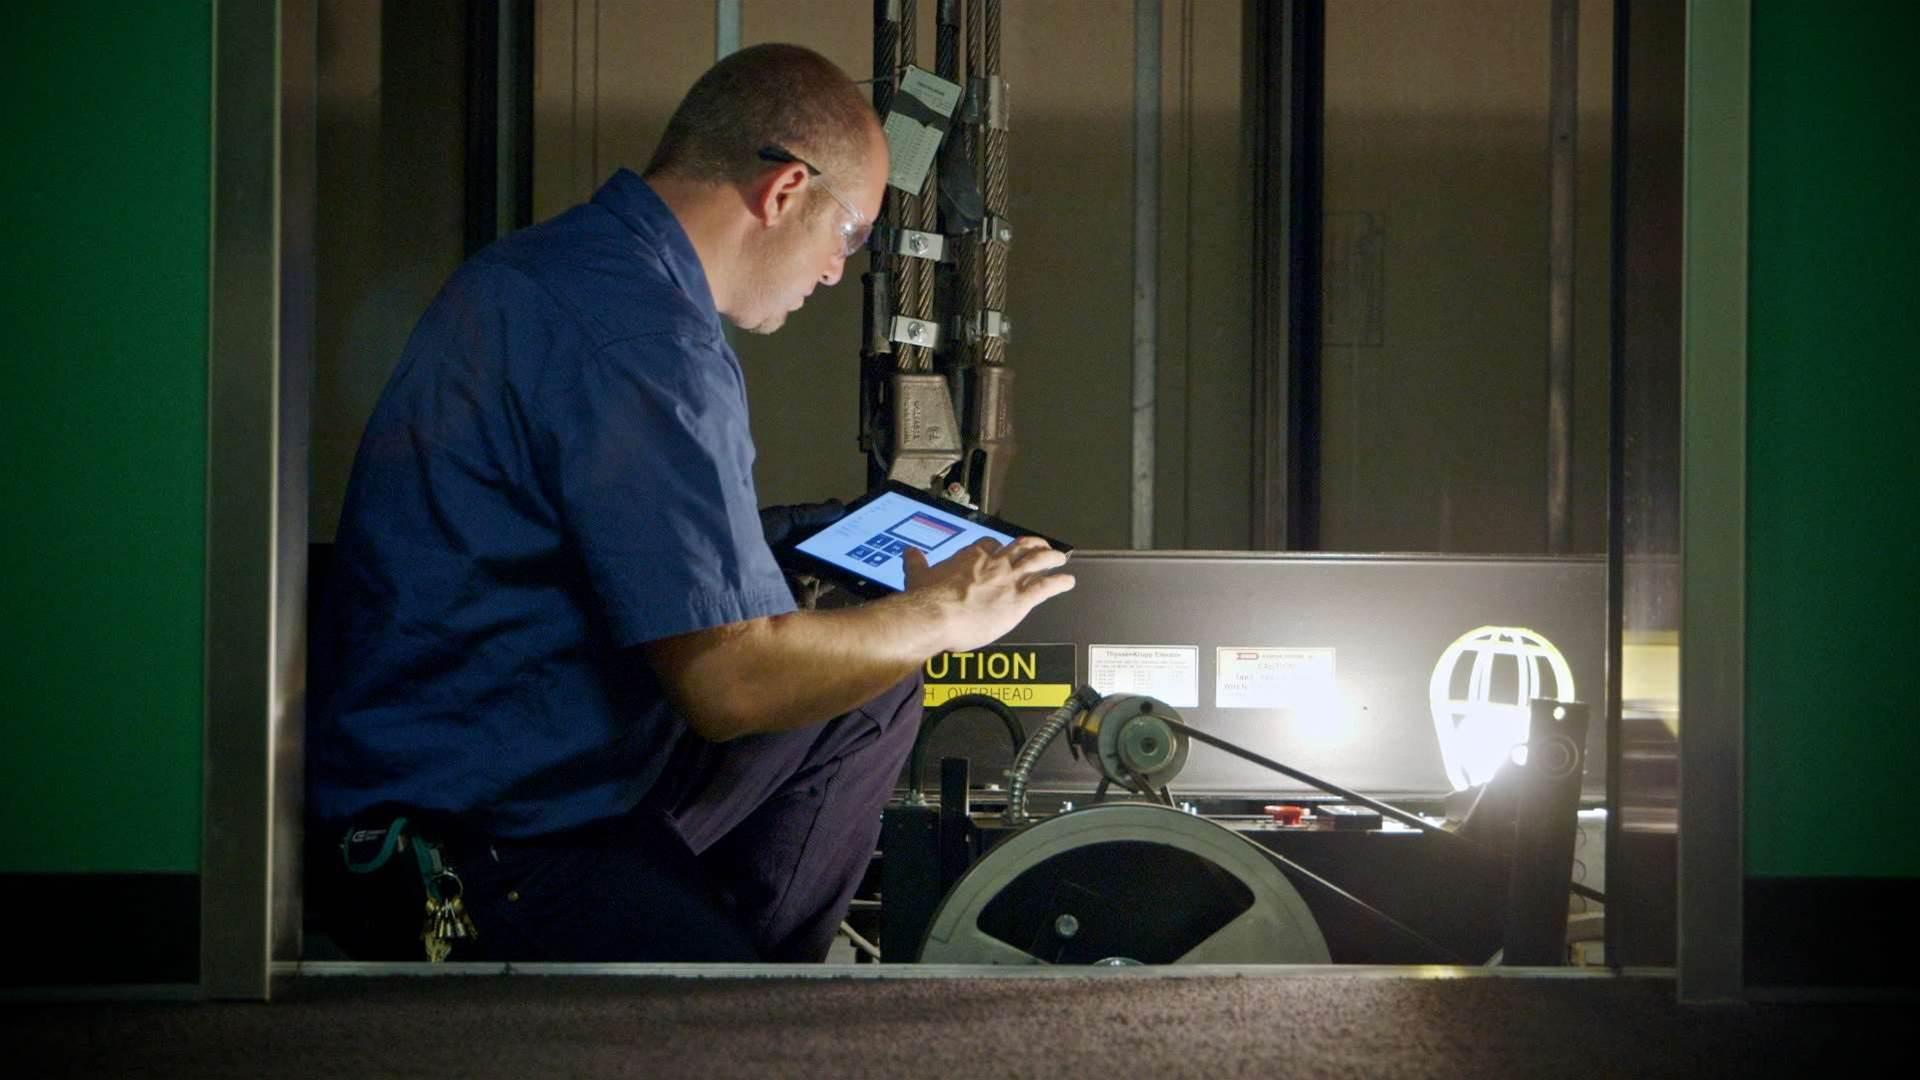 ThyssenKrupp predicts lift maintenance